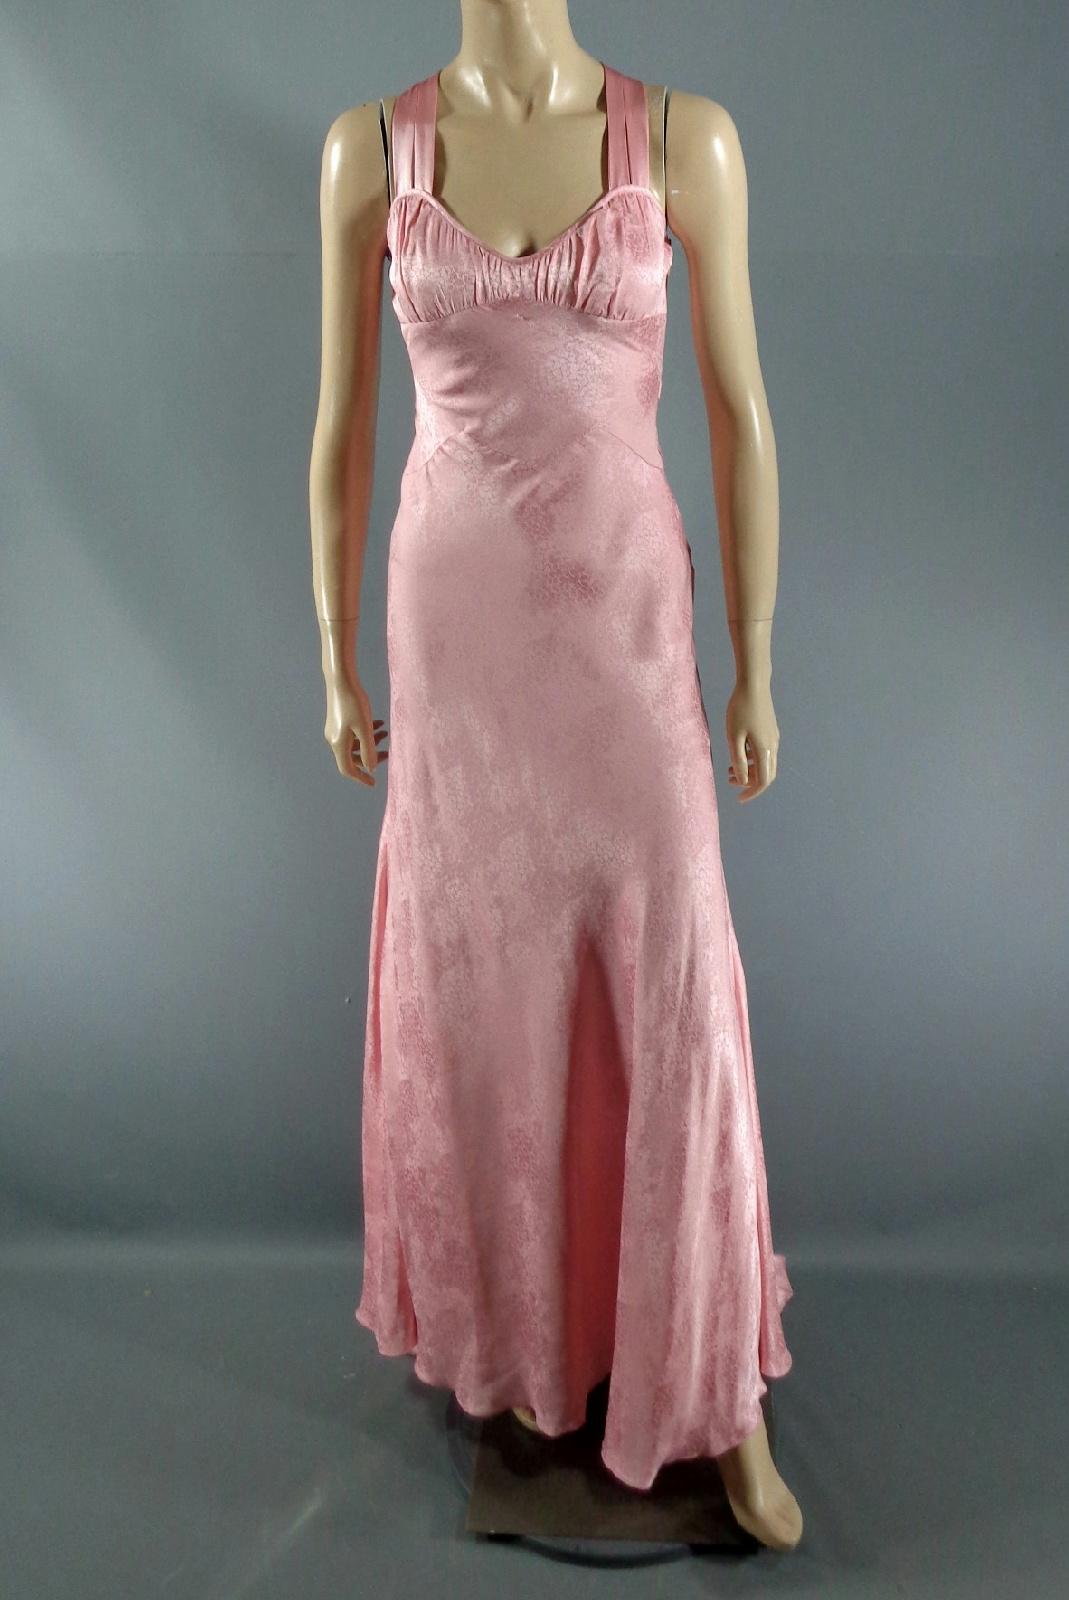 Worn Prom Dresses 121